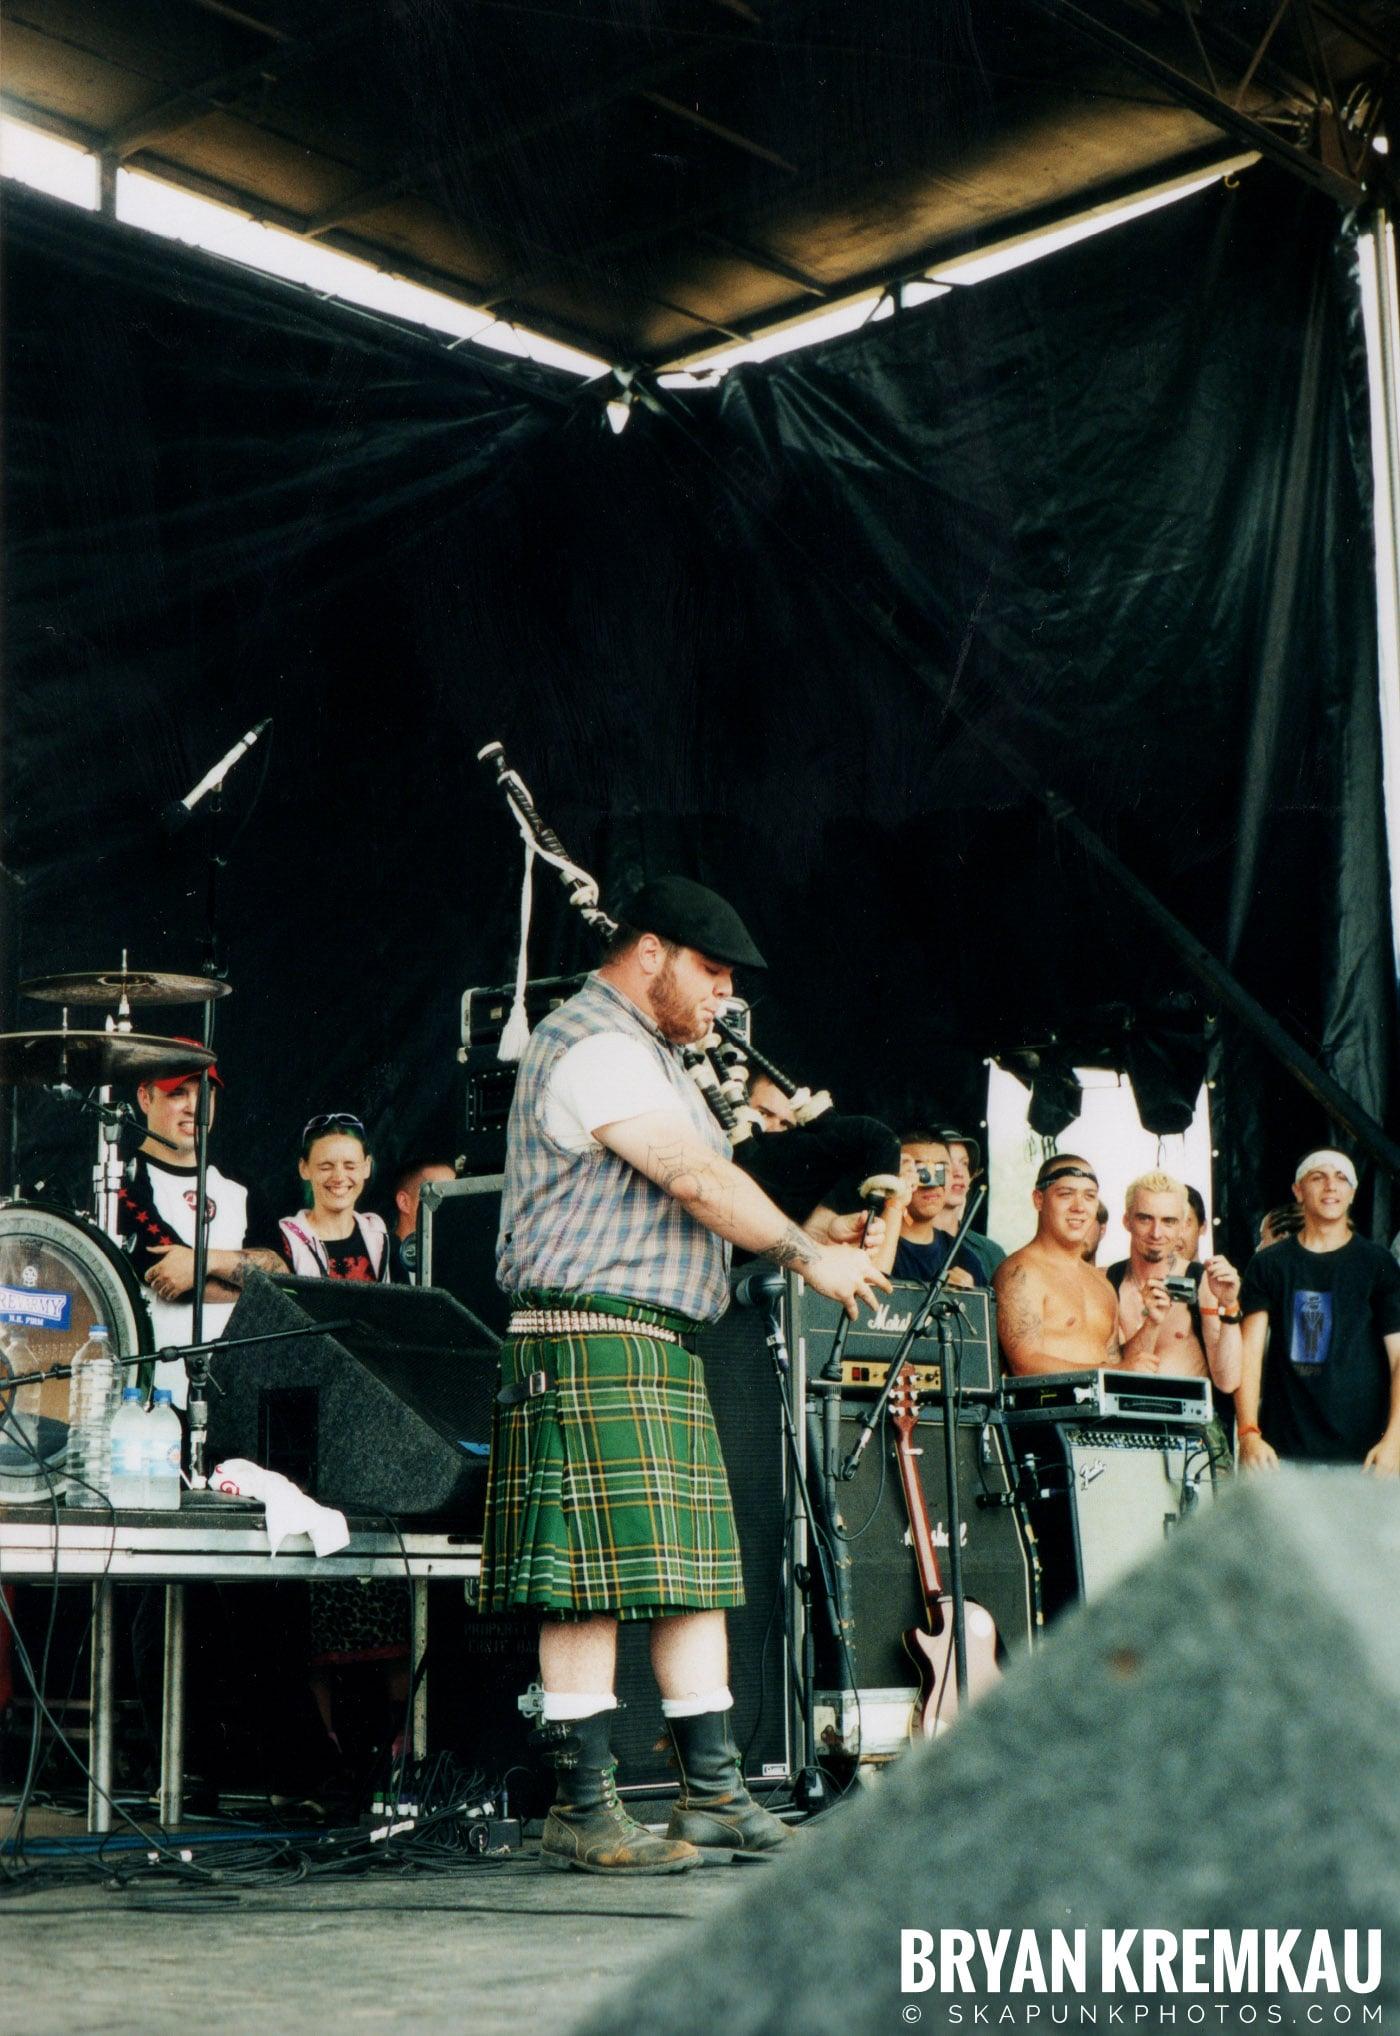 The Dropkick Murphys @ Vans Warped Tour, Randall's Island, NYC - 8.4.01 (14)